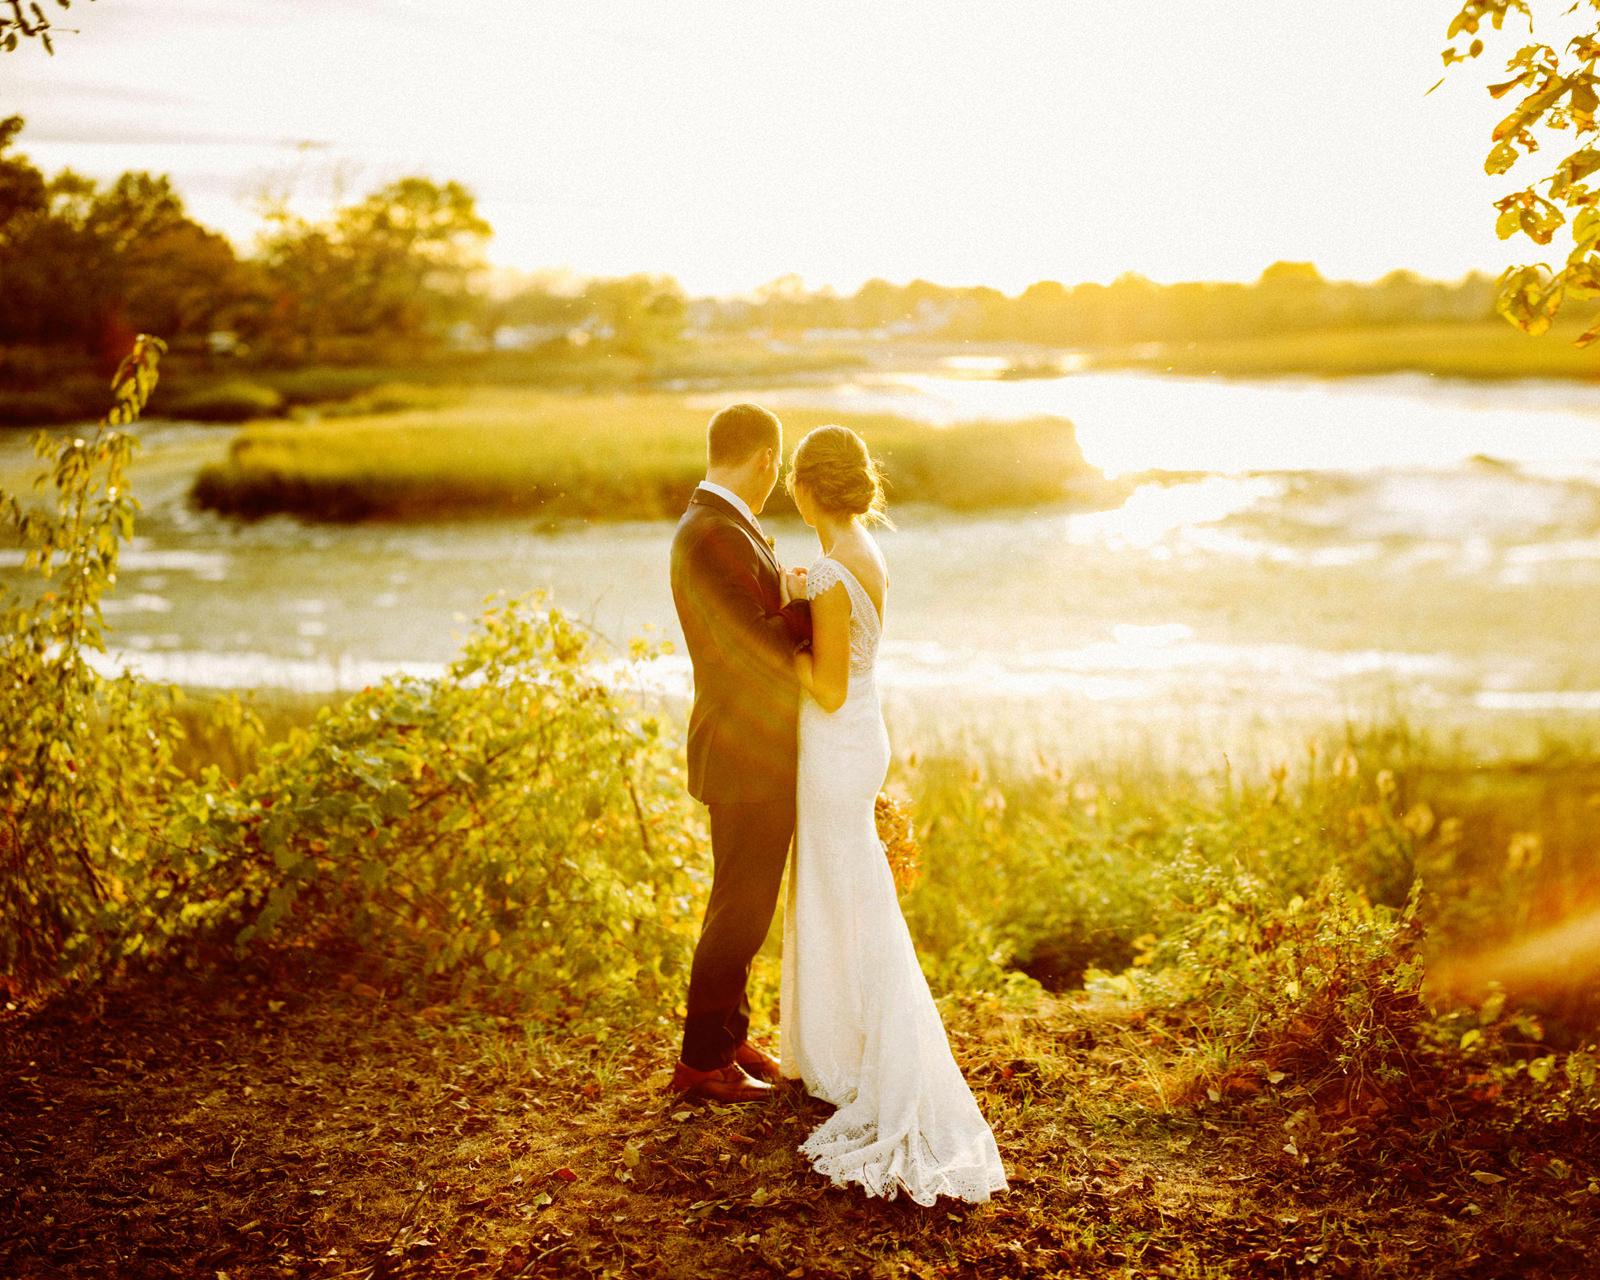 bridgeport-wedding-126 BRIDGEPORT, CONNECTICUT BACKYARD WEDDING